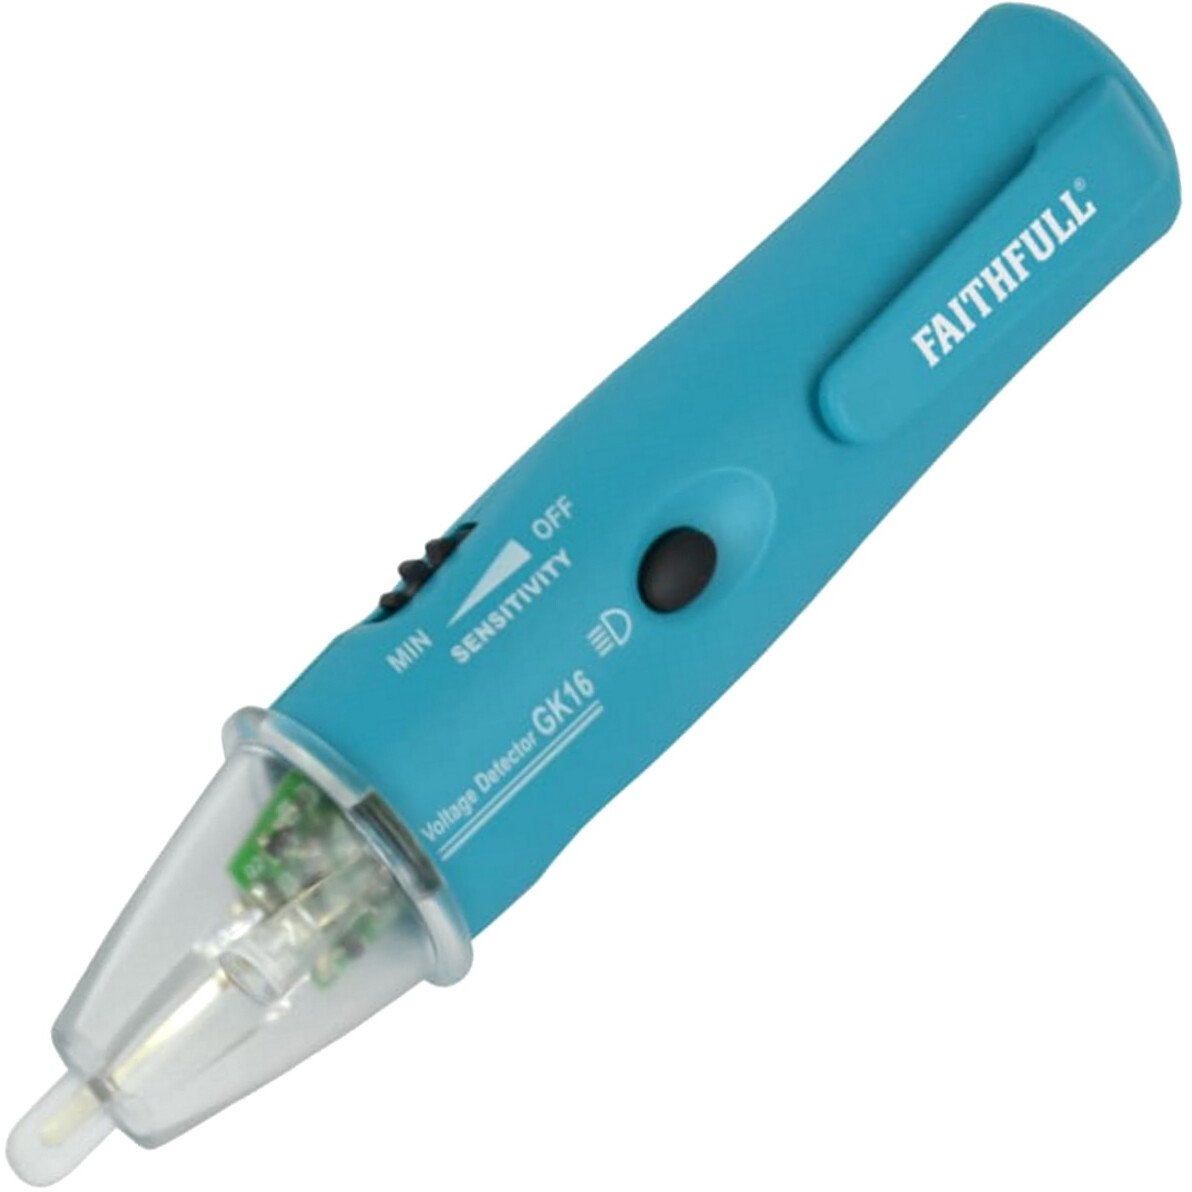 Faithfull GK16 Voltage Detector Stick FAIDETVOLT2